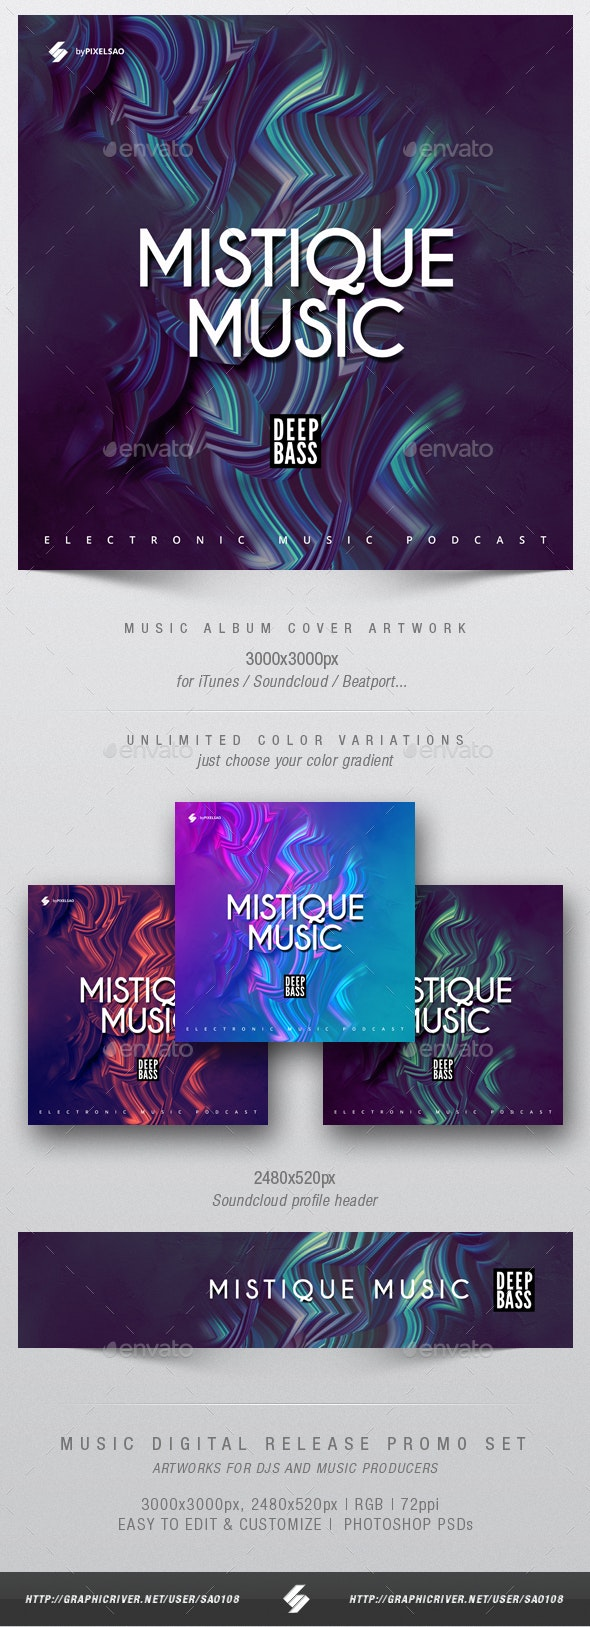 Mystique Music - Album Cover Artwork Template - Miscellaneous Social Media